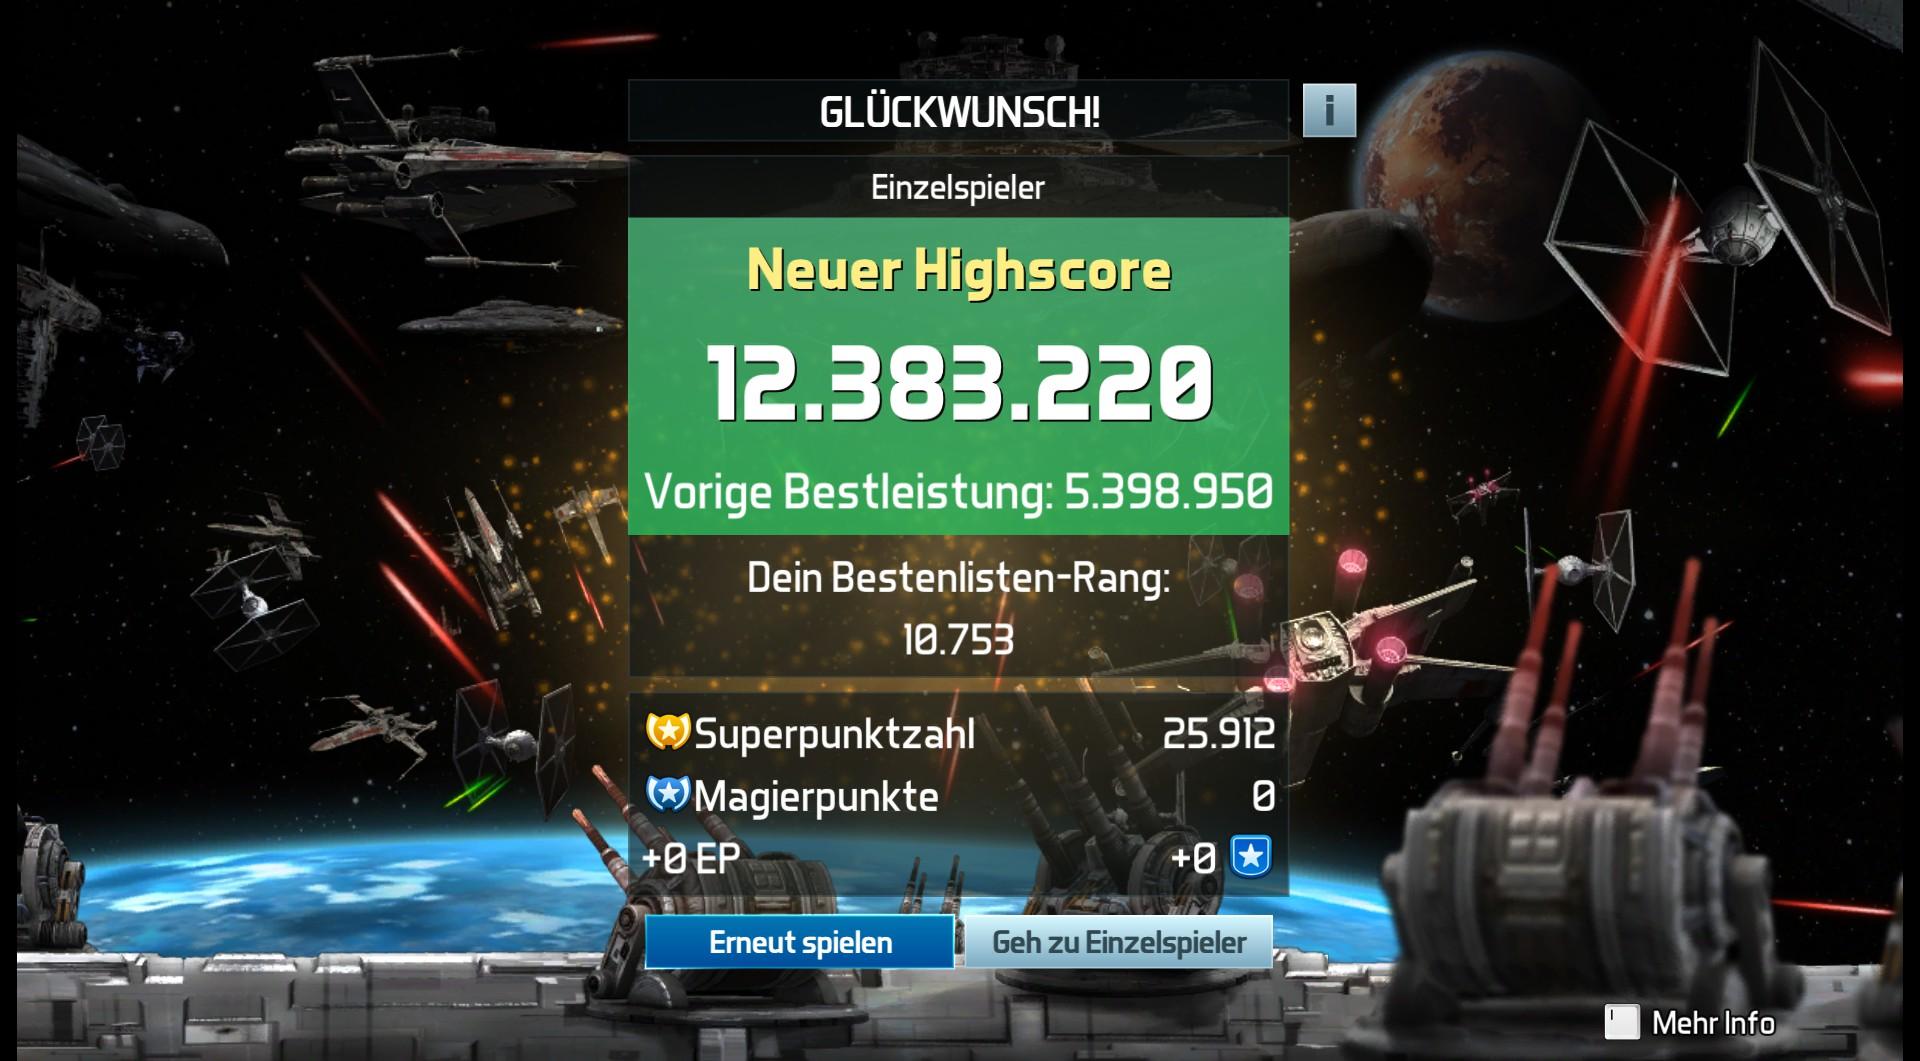 CAC1QU3: Pinball FX3: Star Wars Pinball: Starfighter Assault (PC) 12,383,220 points on 2019-04-18 17:43:27